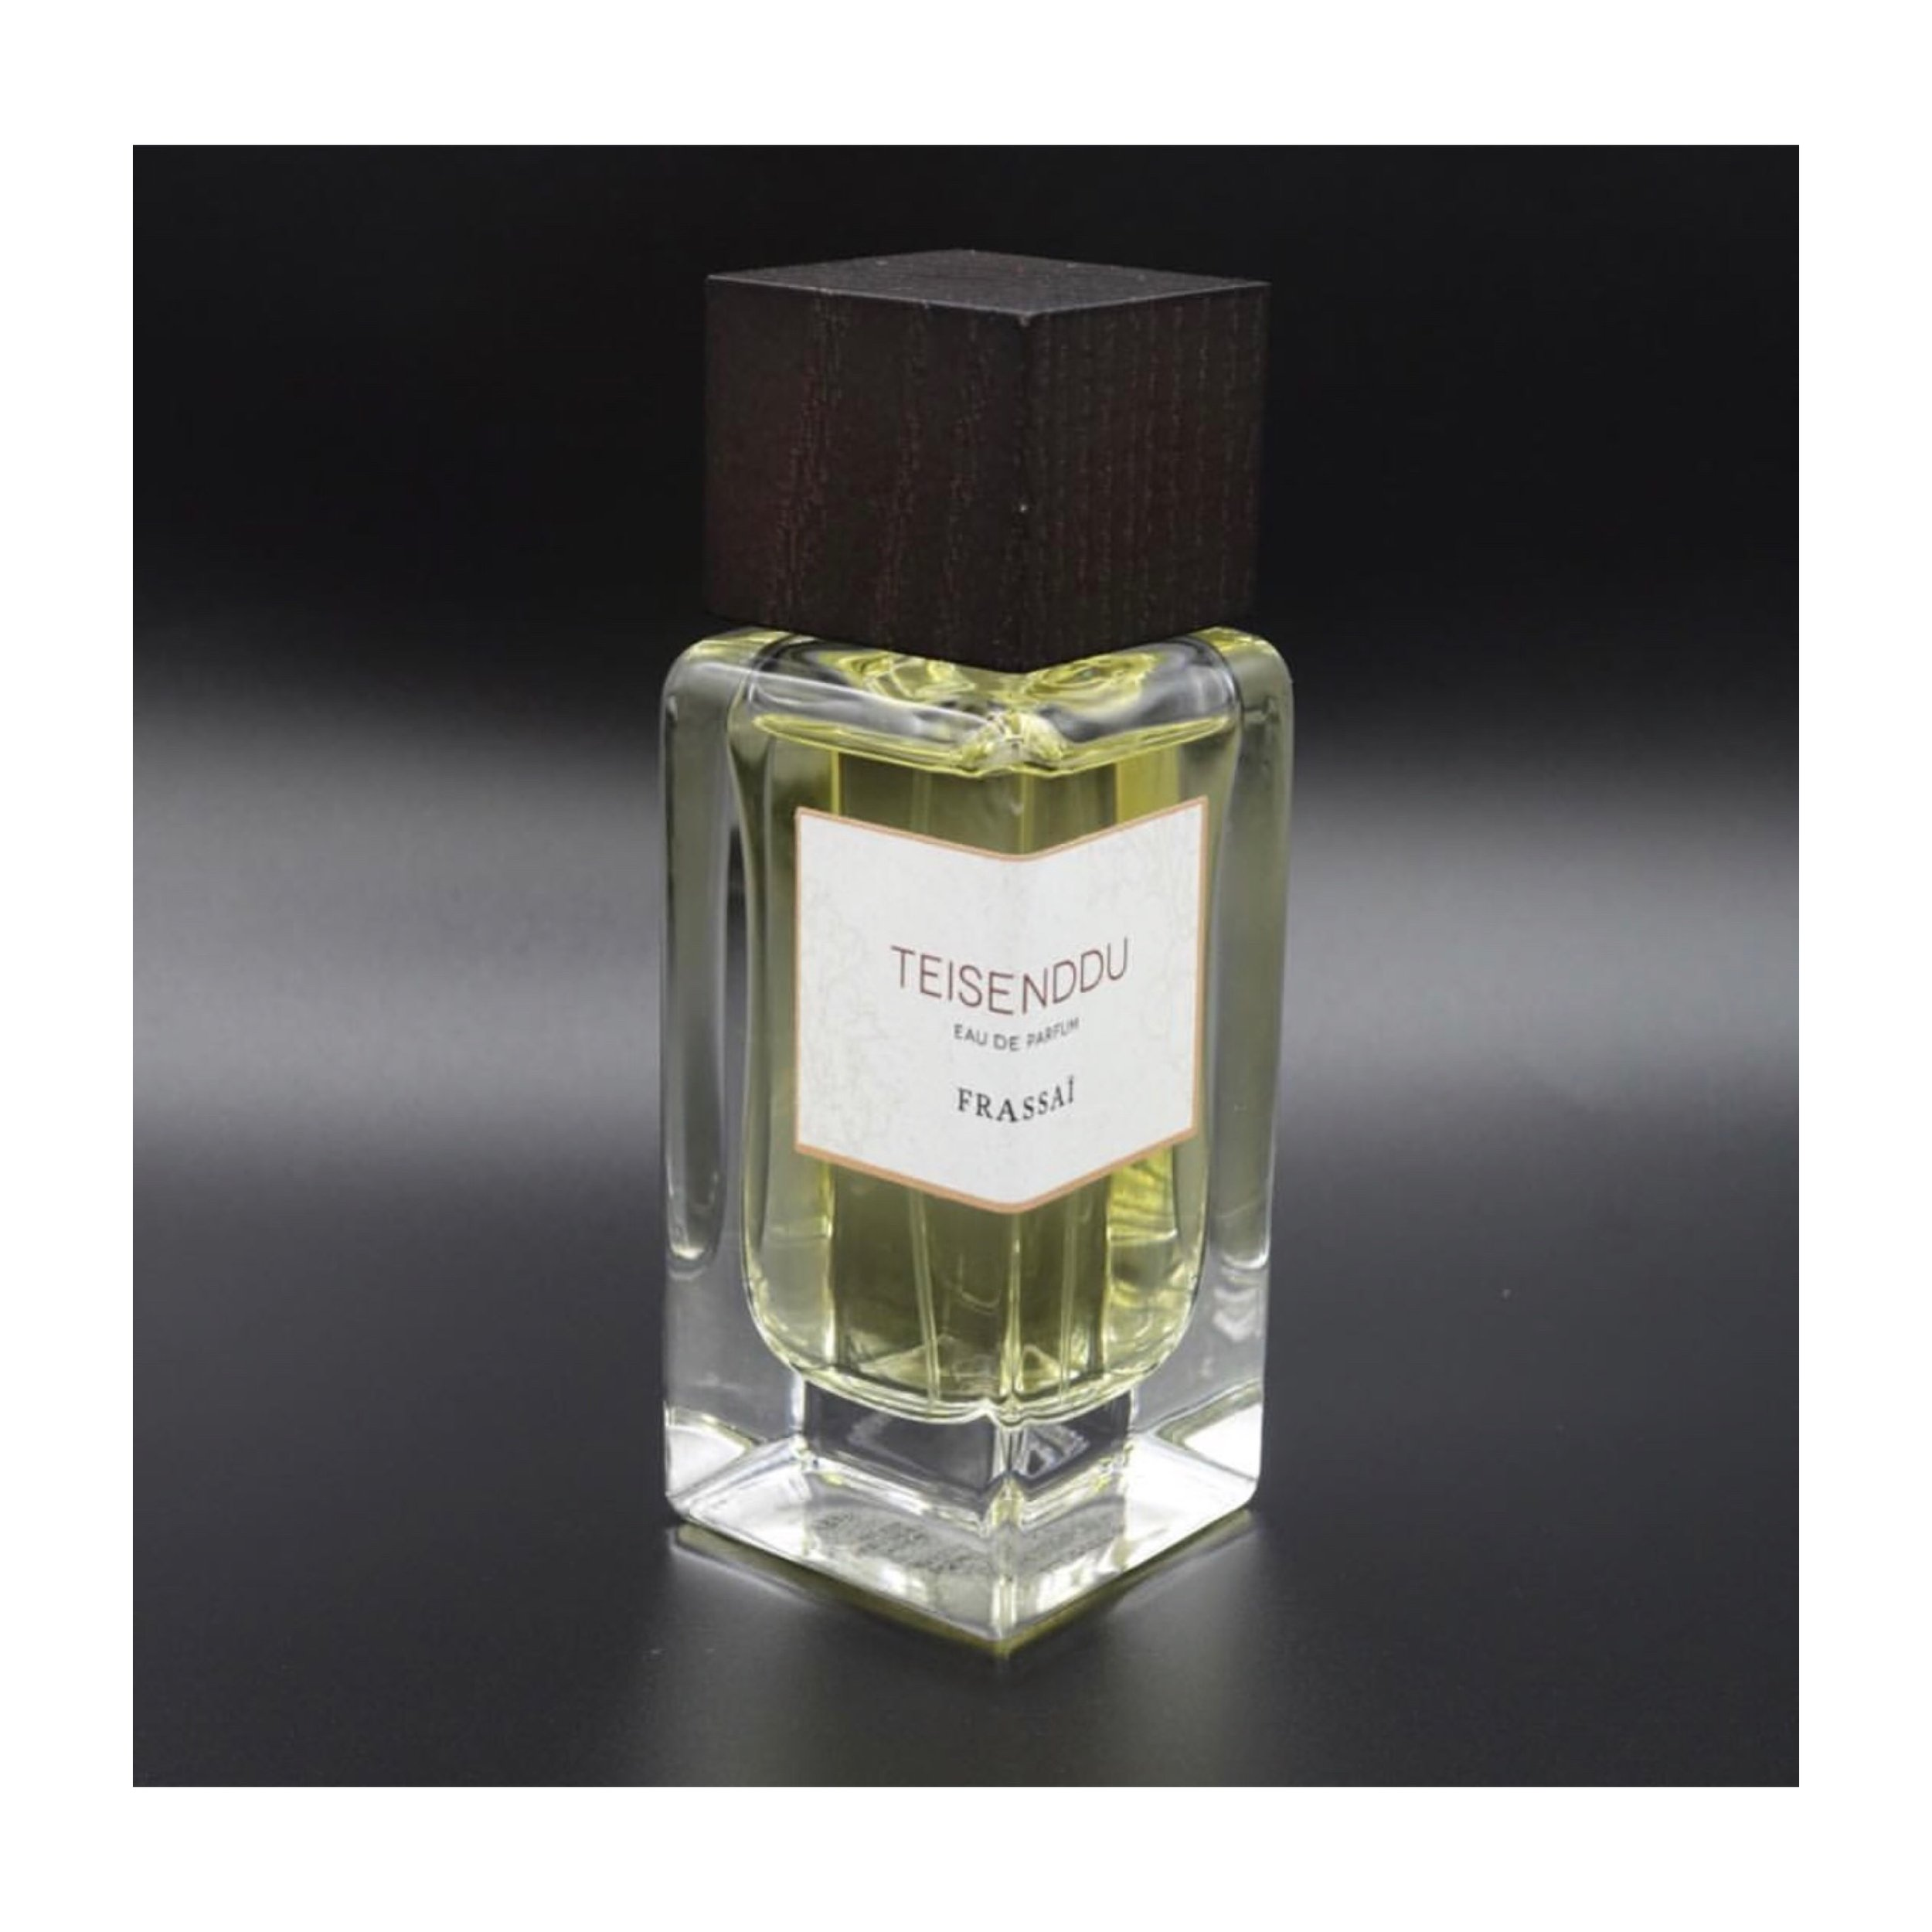 Teisenddu Eau de Parfum, FRASSAÏ. Ph: Prasida Perfume